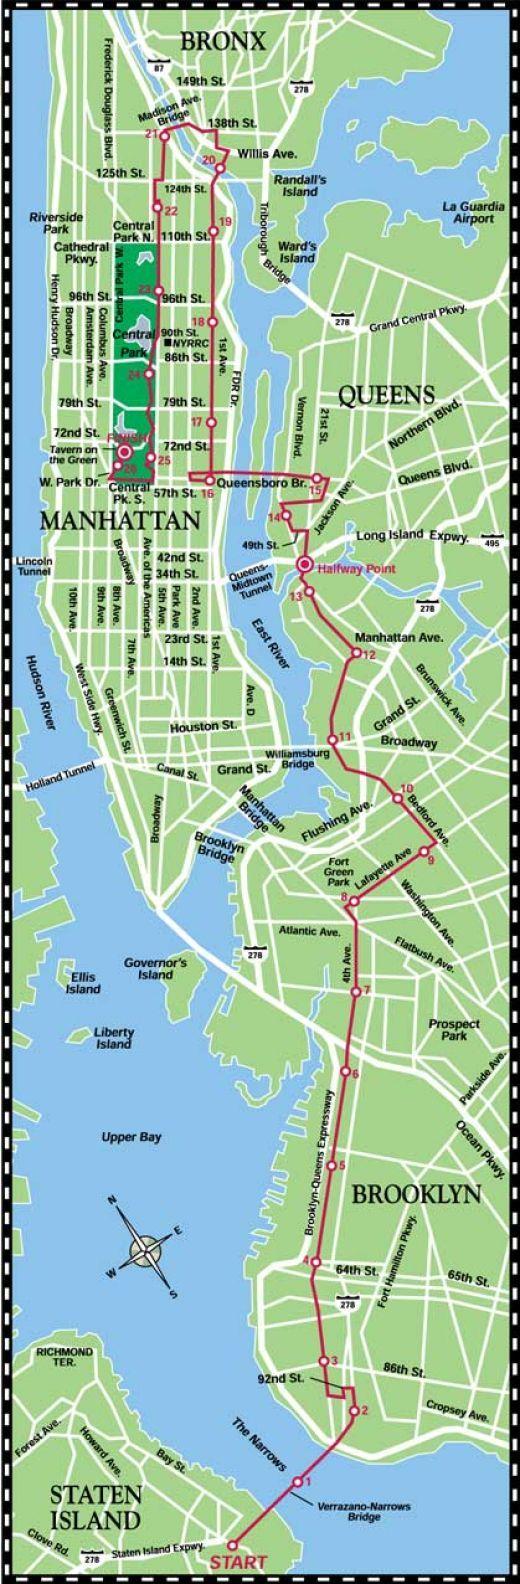 New York Marathon New York Marathon Nyc Marathon City Marathon